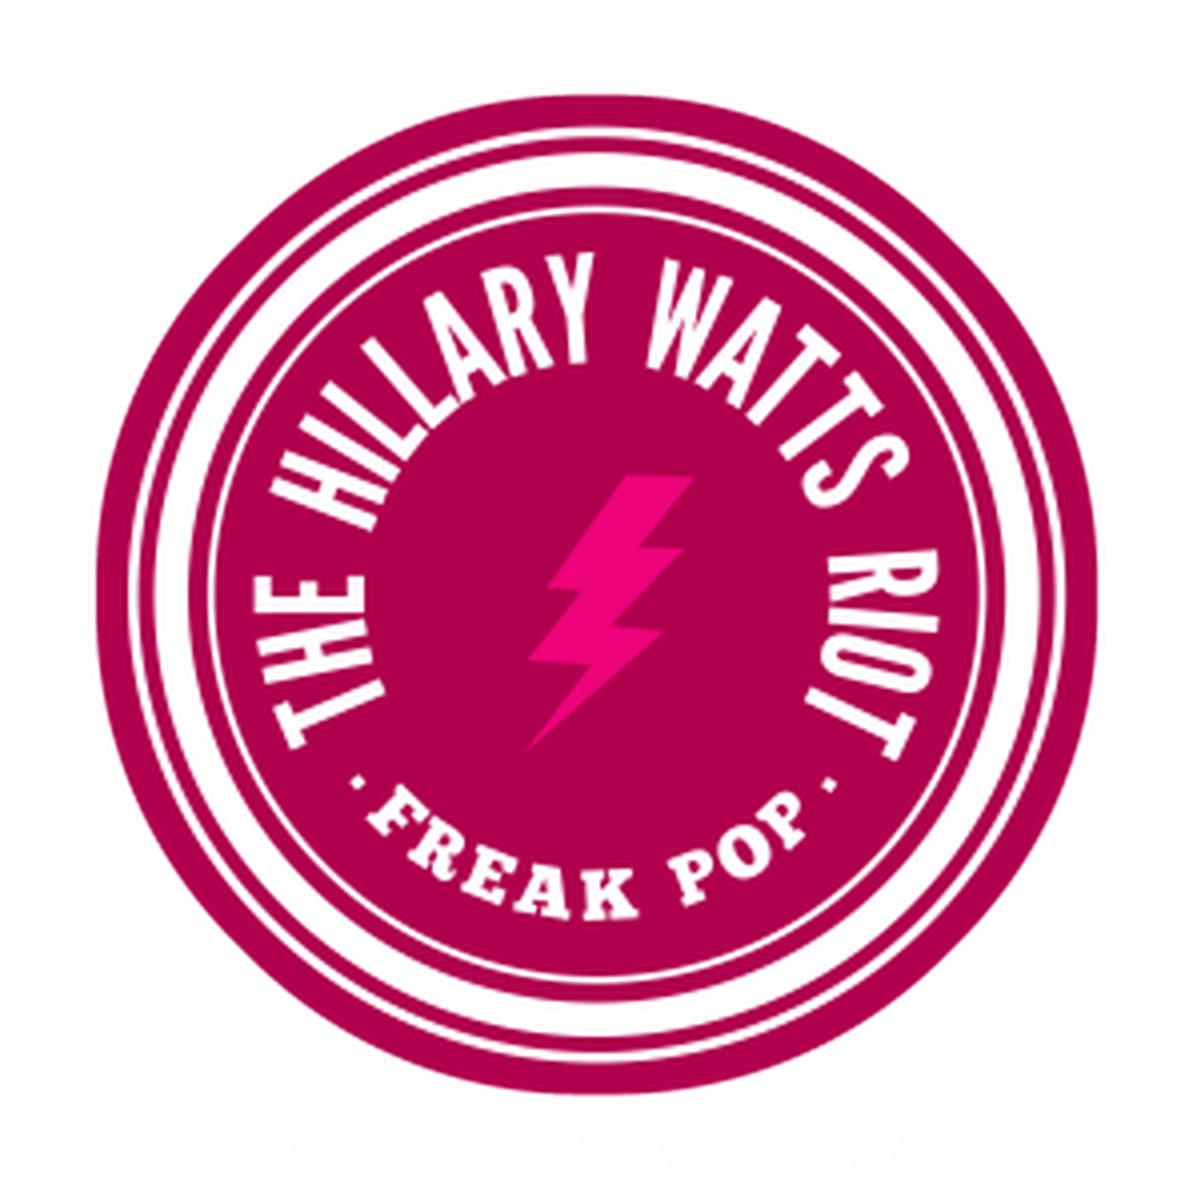 The Hillary Watts Riot